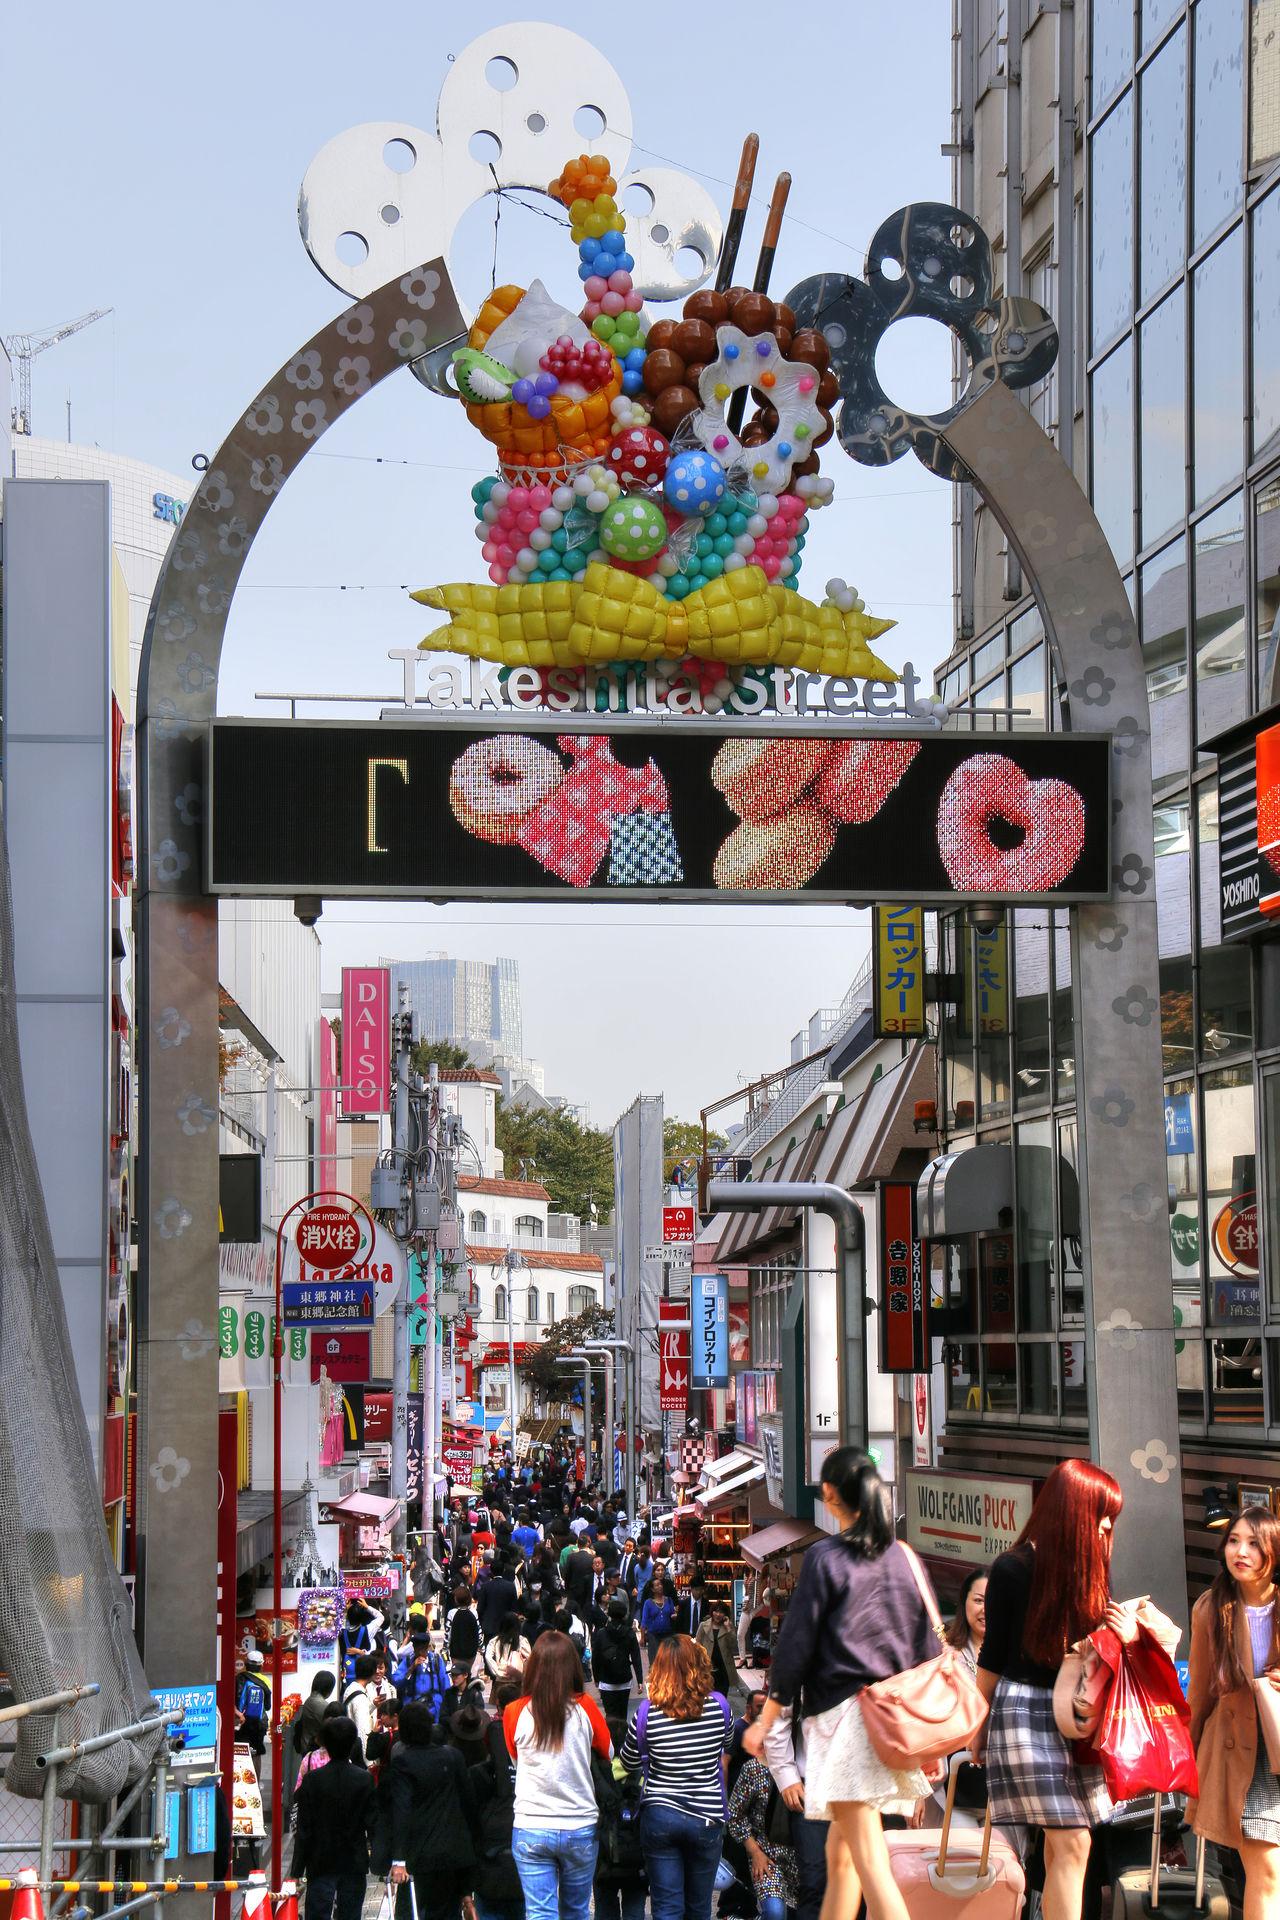 Busy Street City City Life Cosplay Crowd Japan Japanese Culture Manga People Street Takeshita Street Teenagers  Tokyo